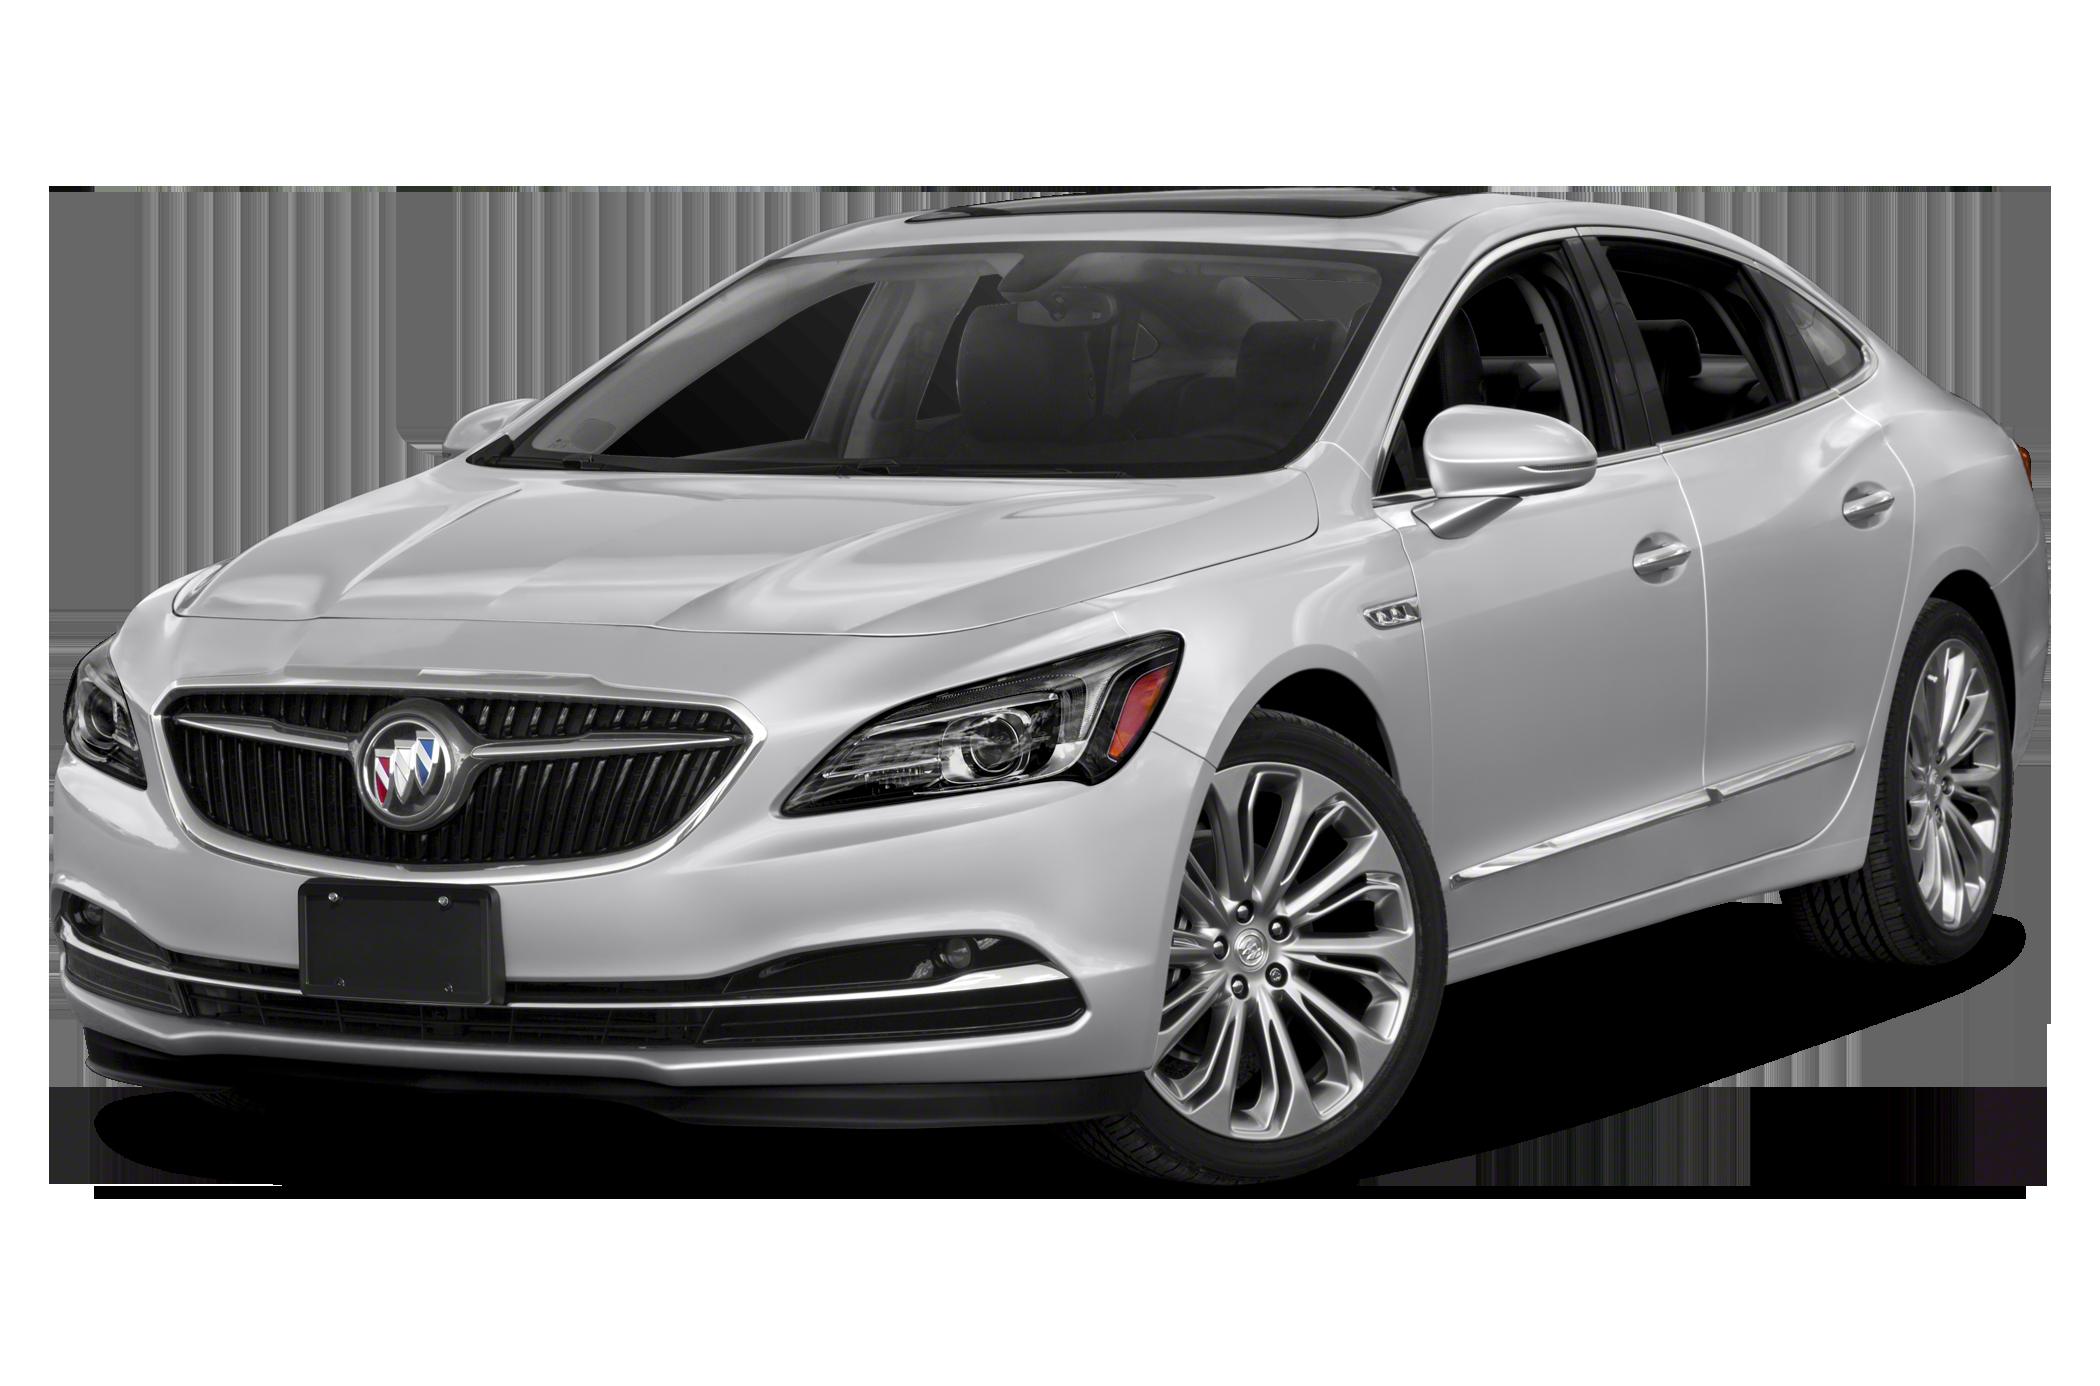 pare Buick Lacrosse to Chevrolet Impala